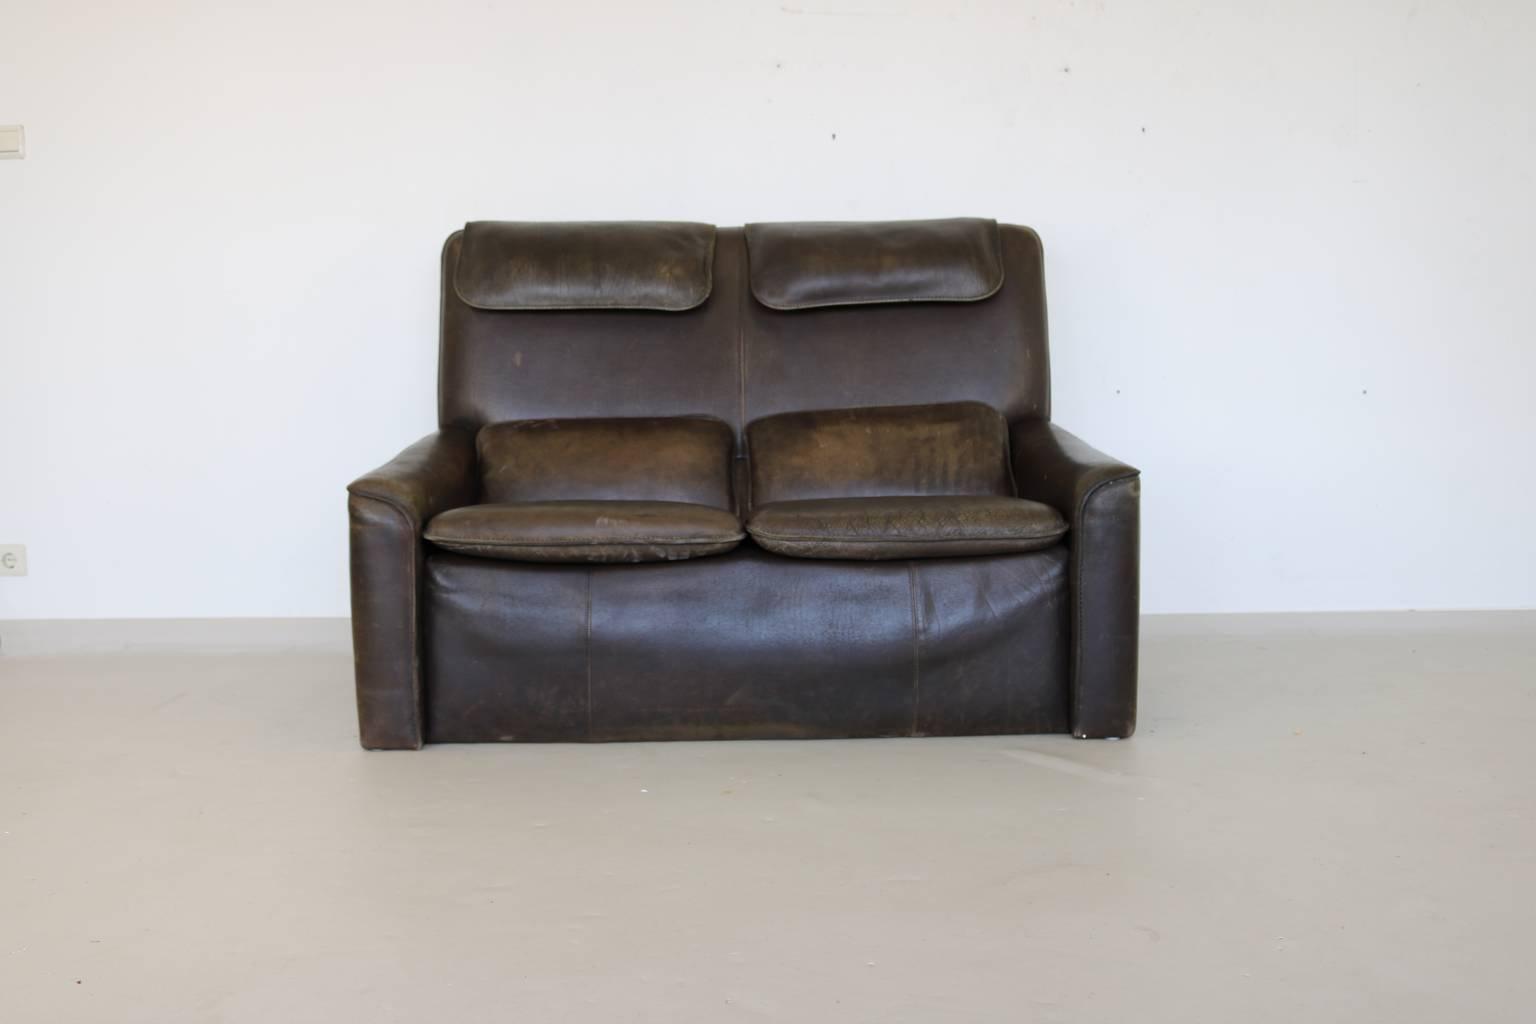 canap marron en cuir 2 places 1970s en vente sur pamono. Black Bedroom Furniture Sets. Home Design Ideas